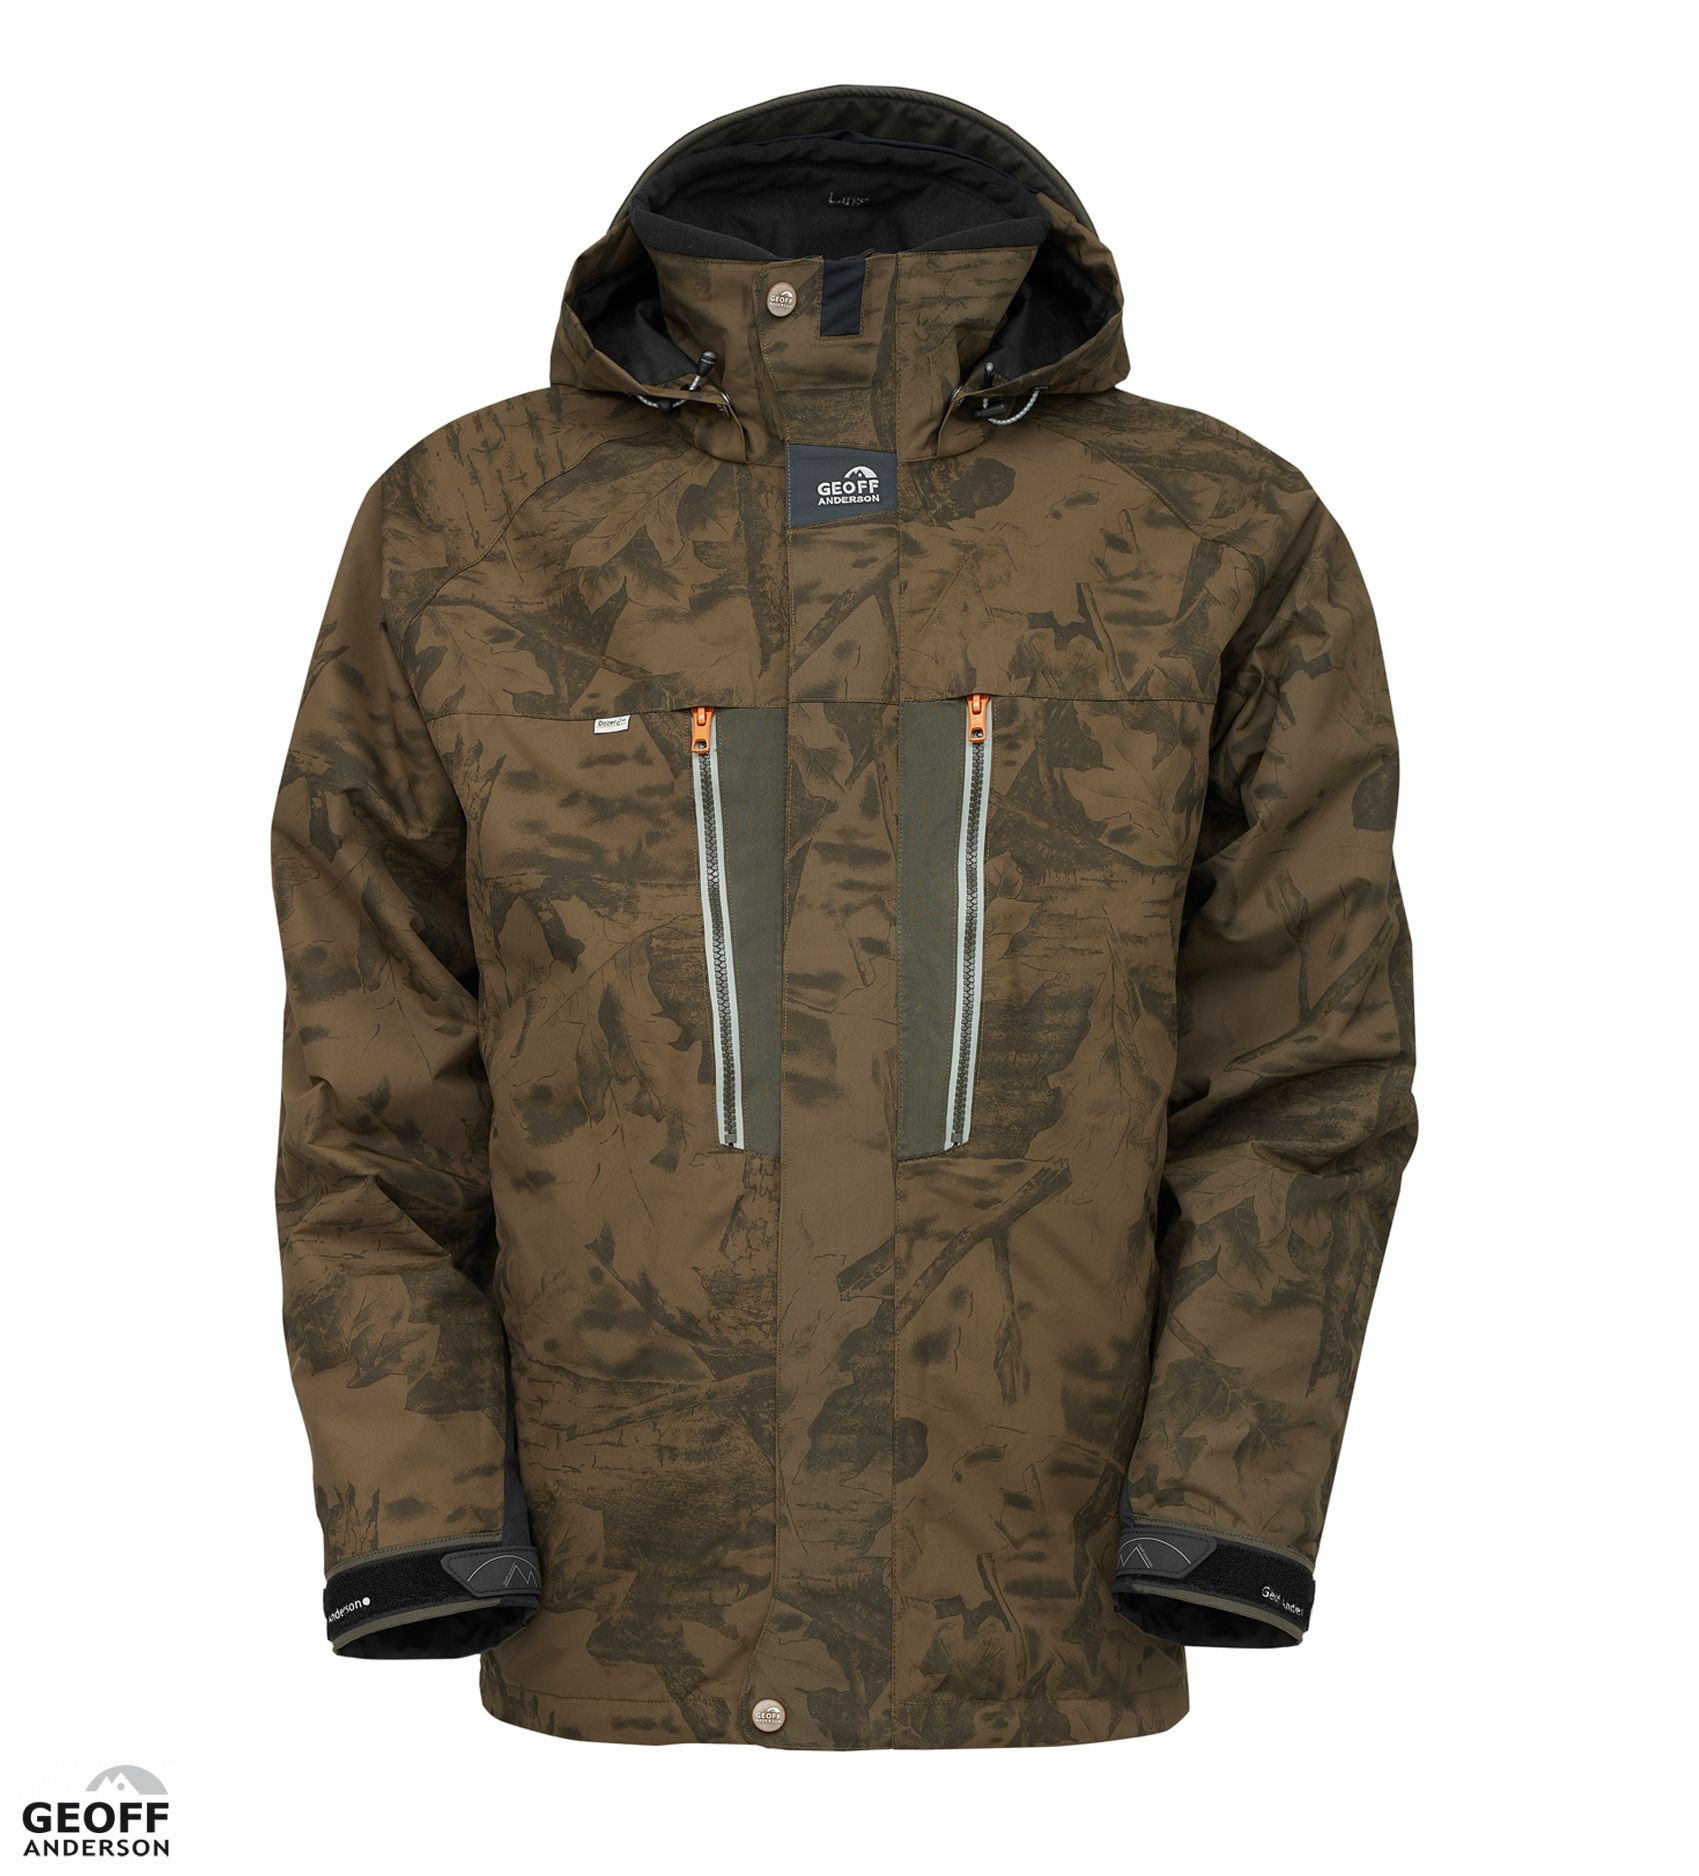 Dozer-6-leaf-best-jacket.wm